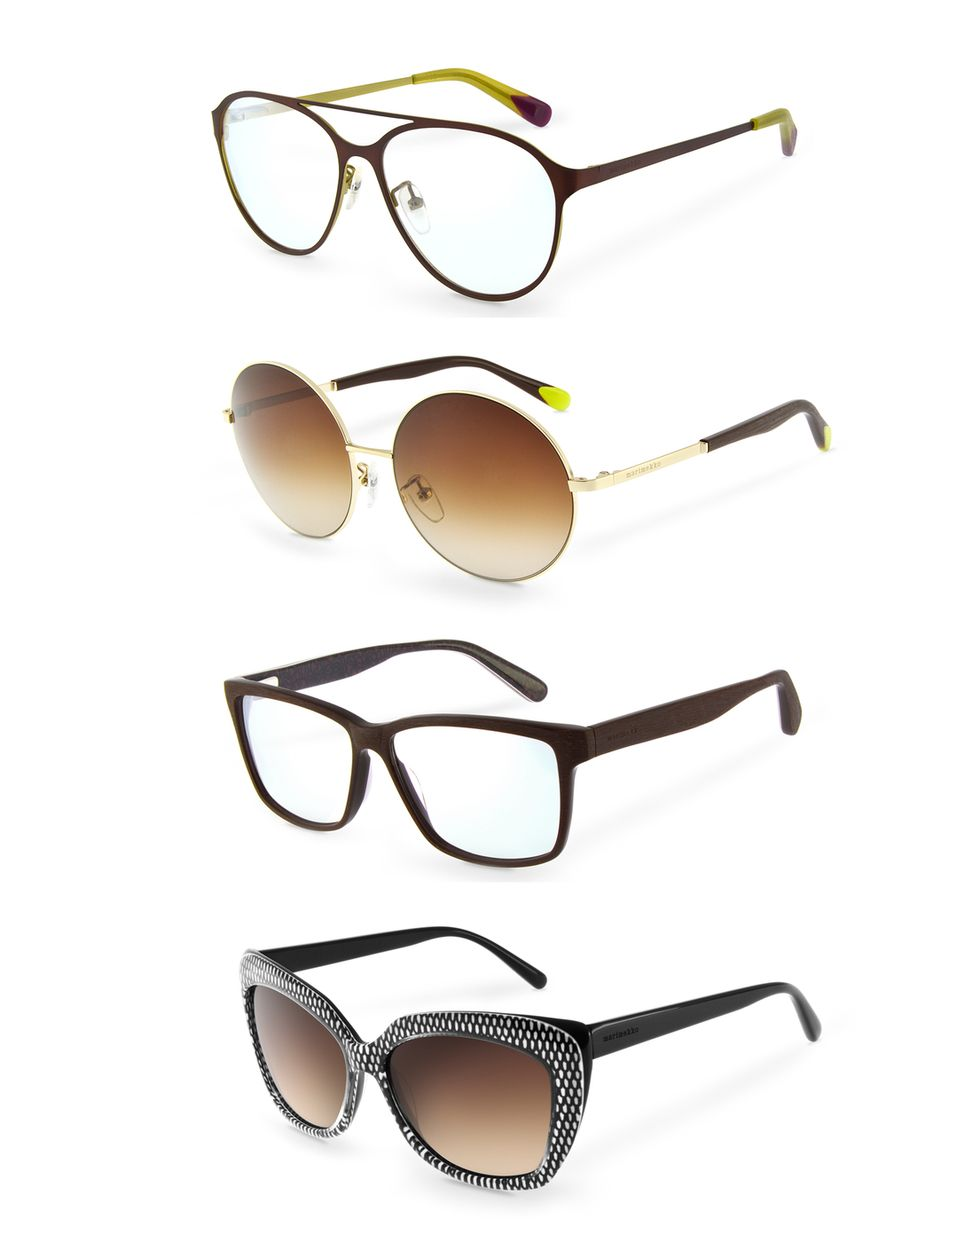 Marimekko Eyewear in Pupulandia - Blogi | Lily.fi